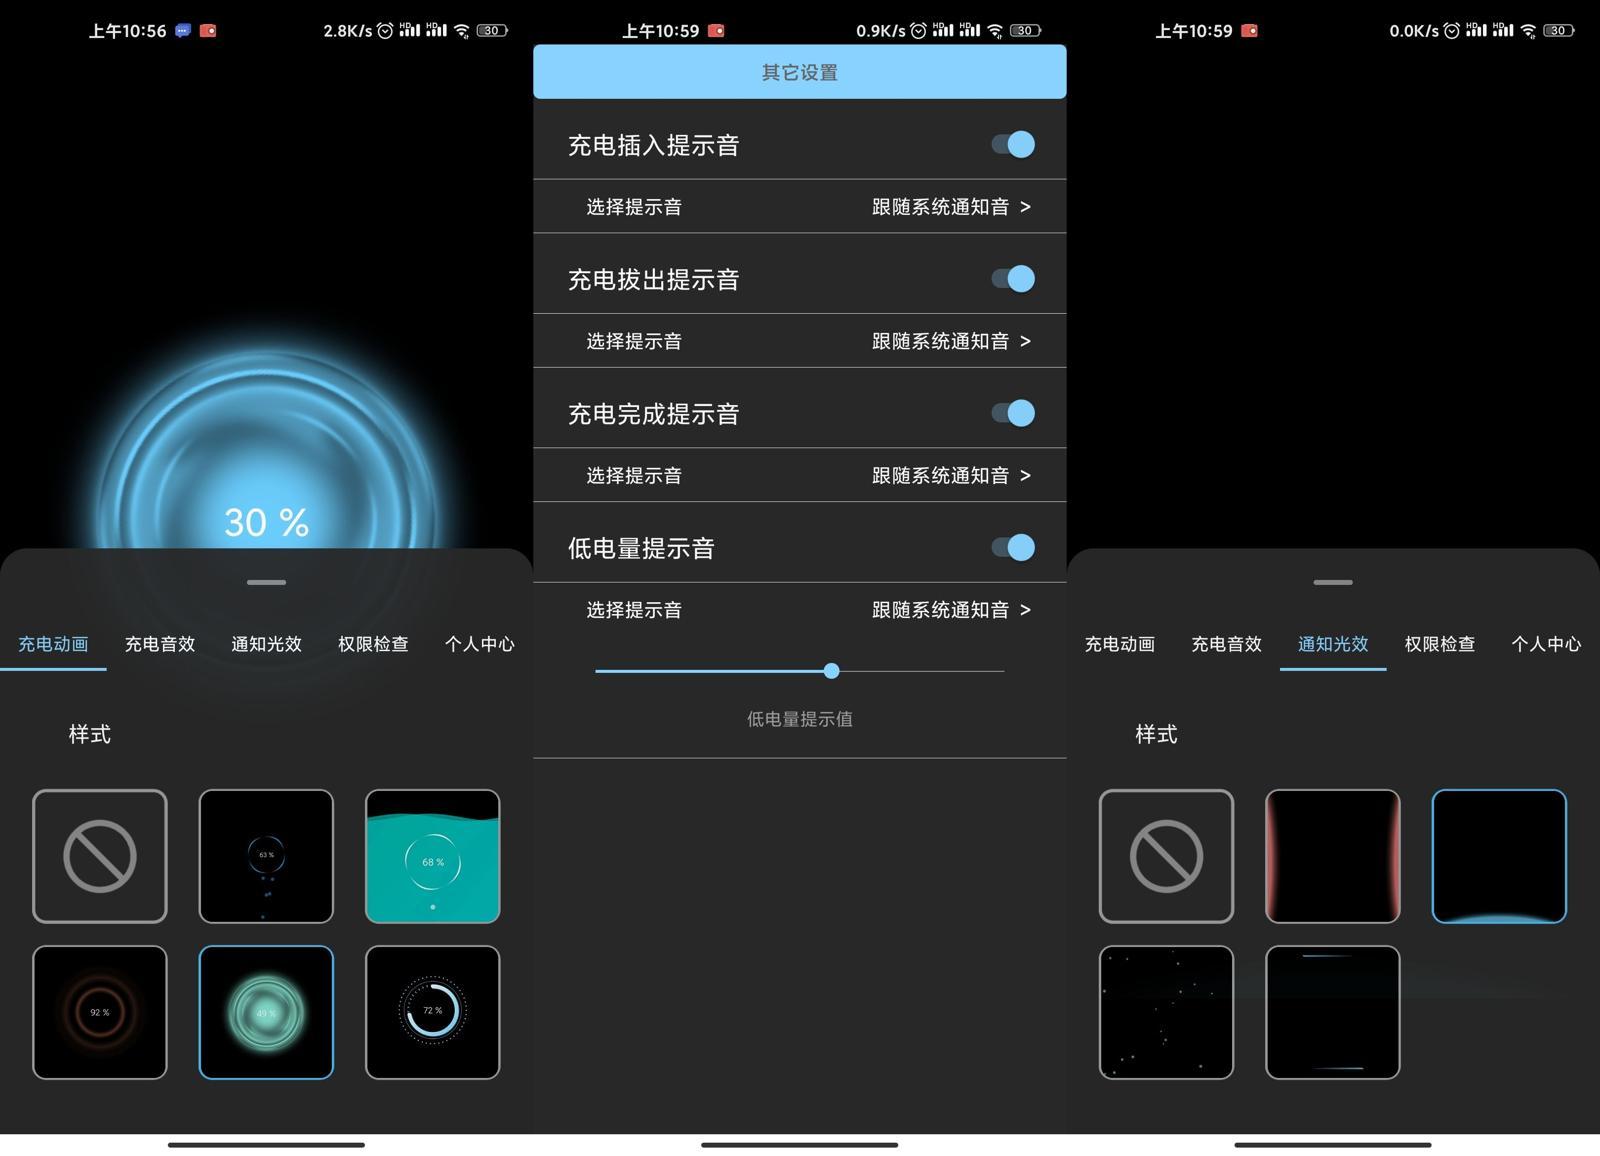 DIY你的安卓手机 光兮v1.3.0.1